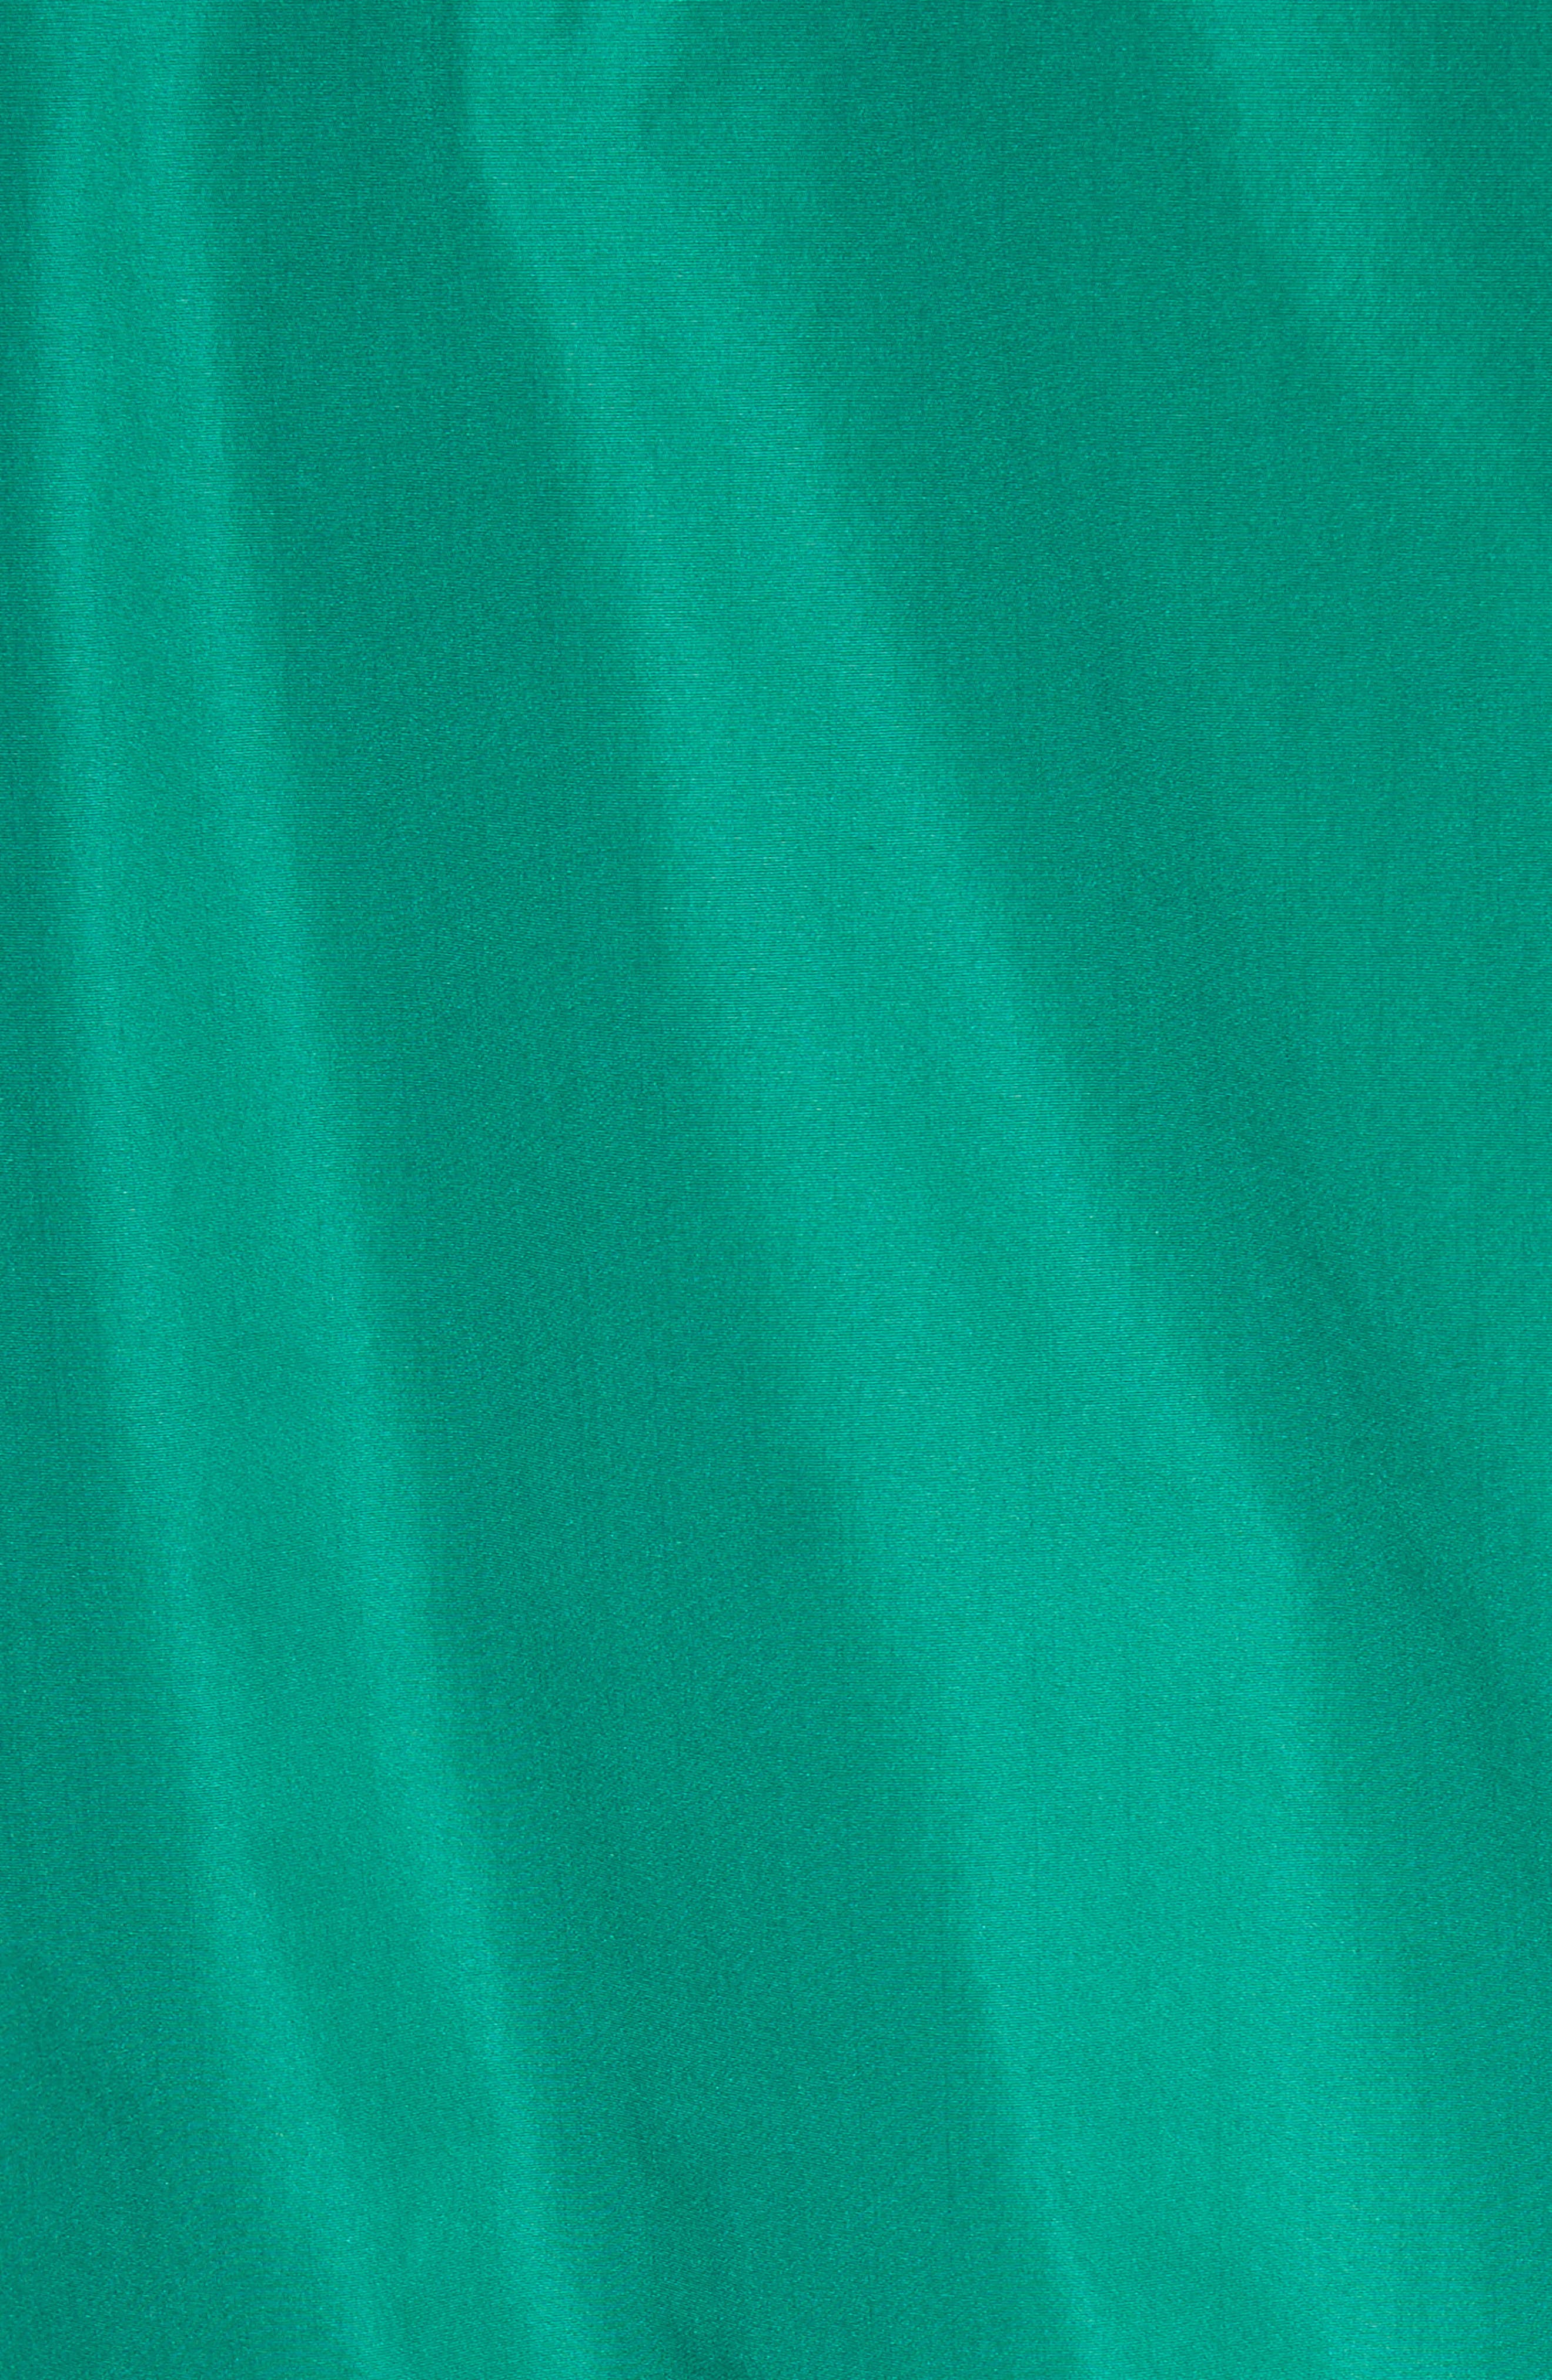 Lightweight Taffeta Hooded Jacket,                             Alternate thumbnail 6, color,                             310